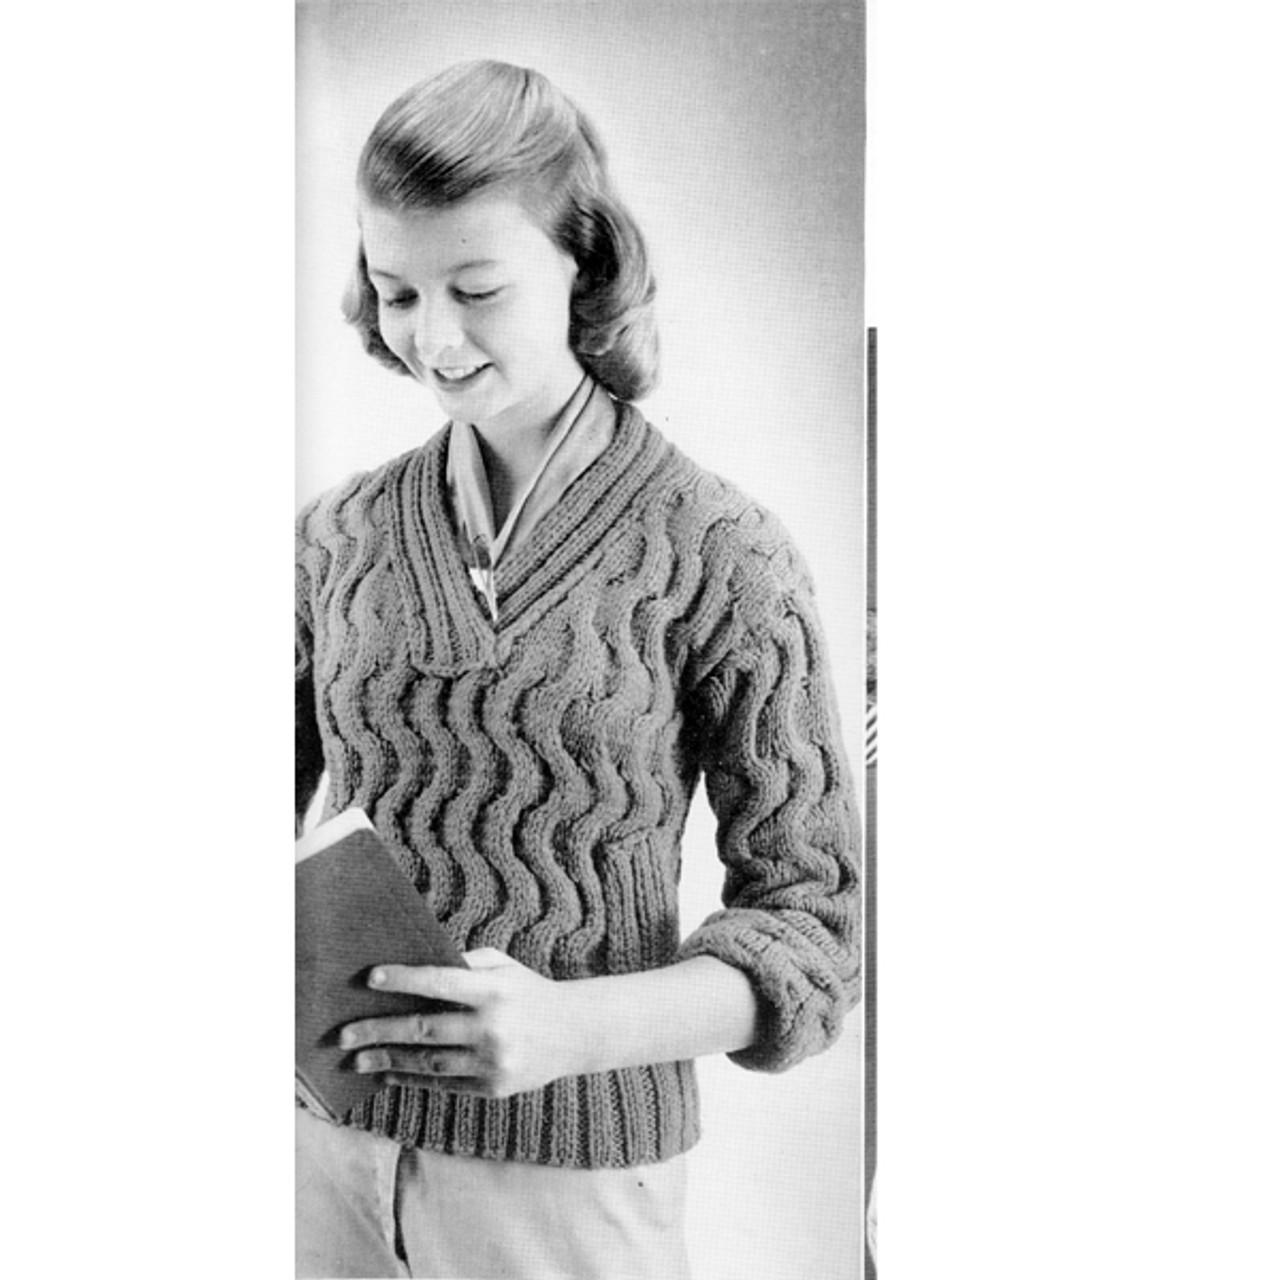 Juniors Knitted Pullover Pattern in Bernat Cuddlespun